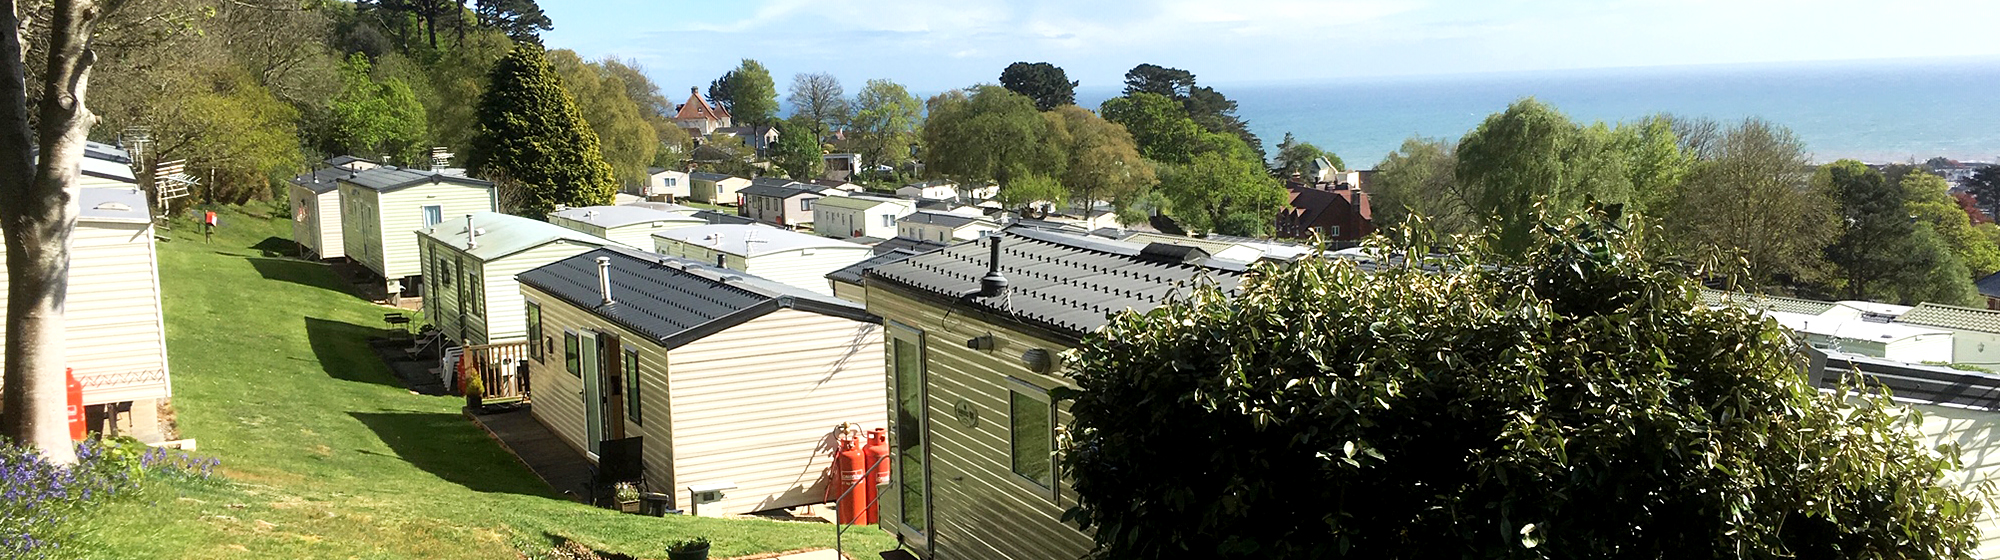 Timber Vale, Slider Image, Lyme Regis, Caravan Park, Campsite, Dorset, Jurassic Coast, Dorset Campsite